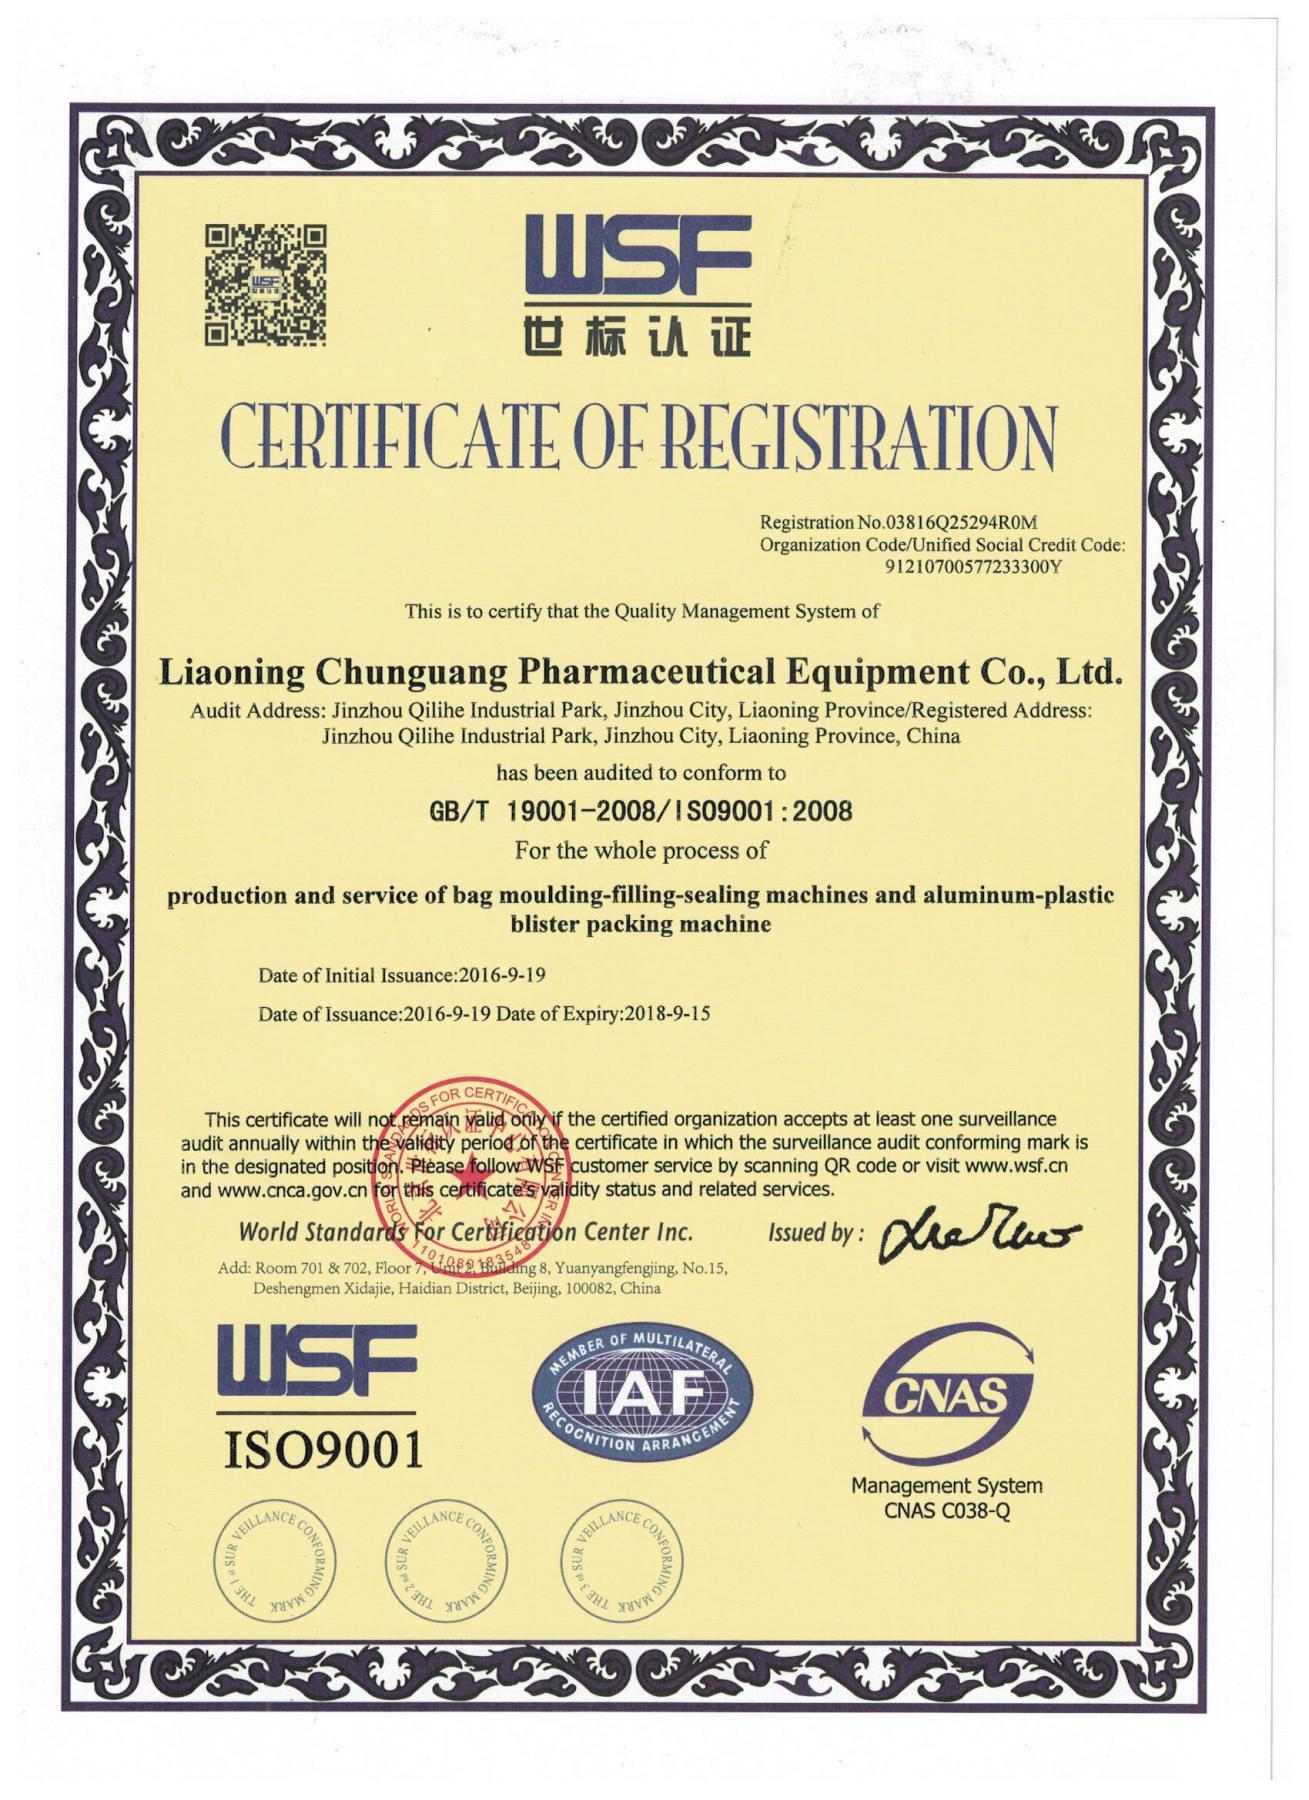 WSF certification